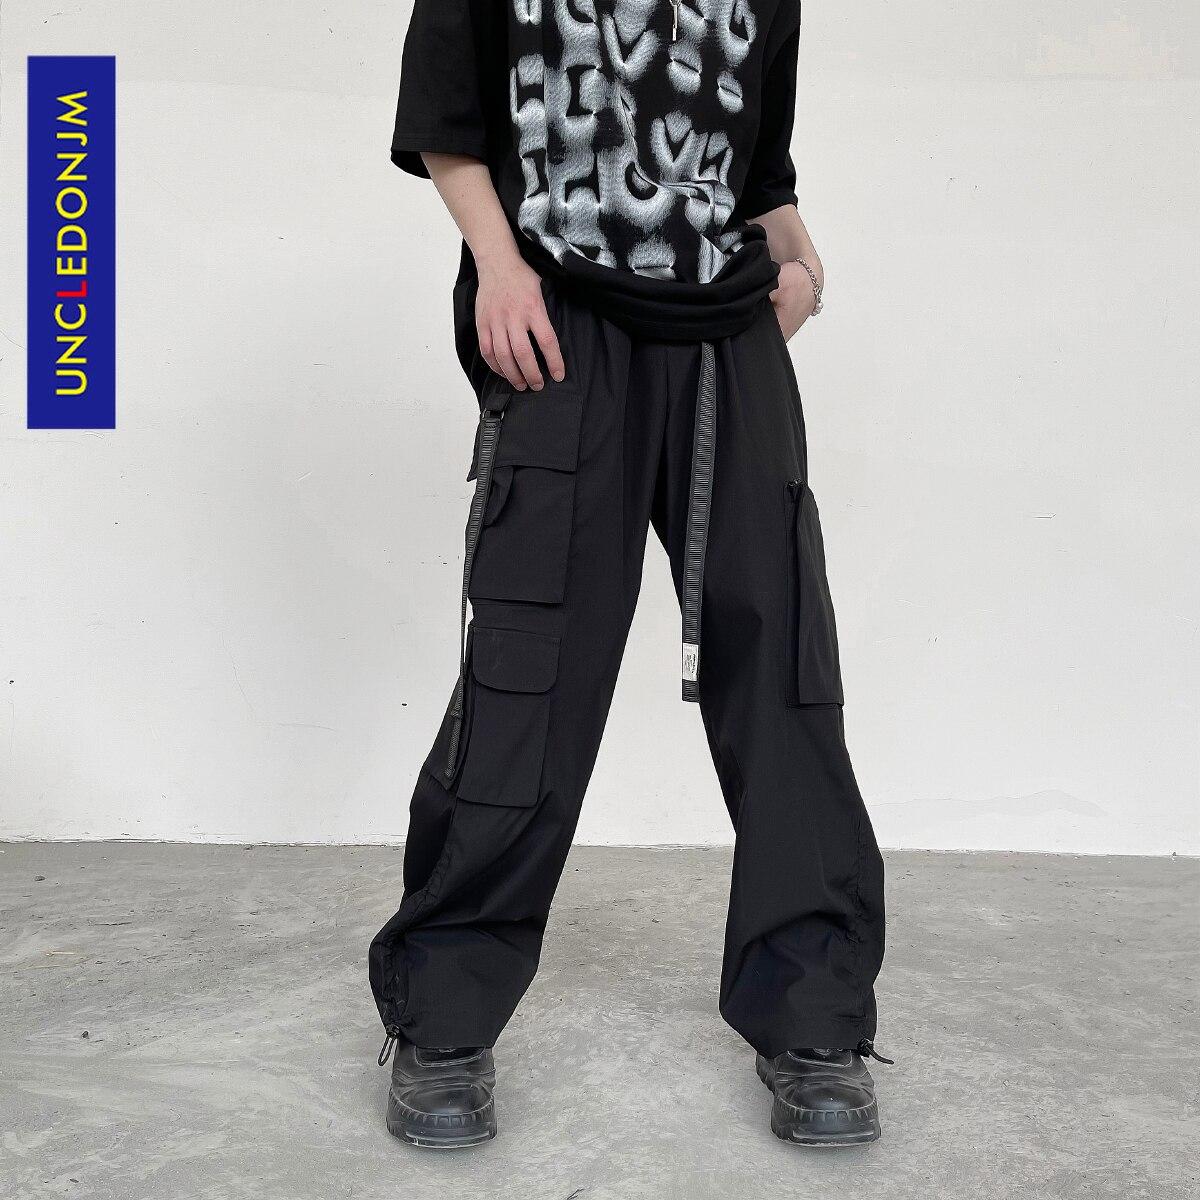 UNCLEDONJM-بنطلون كارغو للرجال ، حزام خصر ، ملابس الشارع ، متعدد الجيوب ، مكدس ، بدلة رياضية هيب هوب ، فضفاض ، U20322